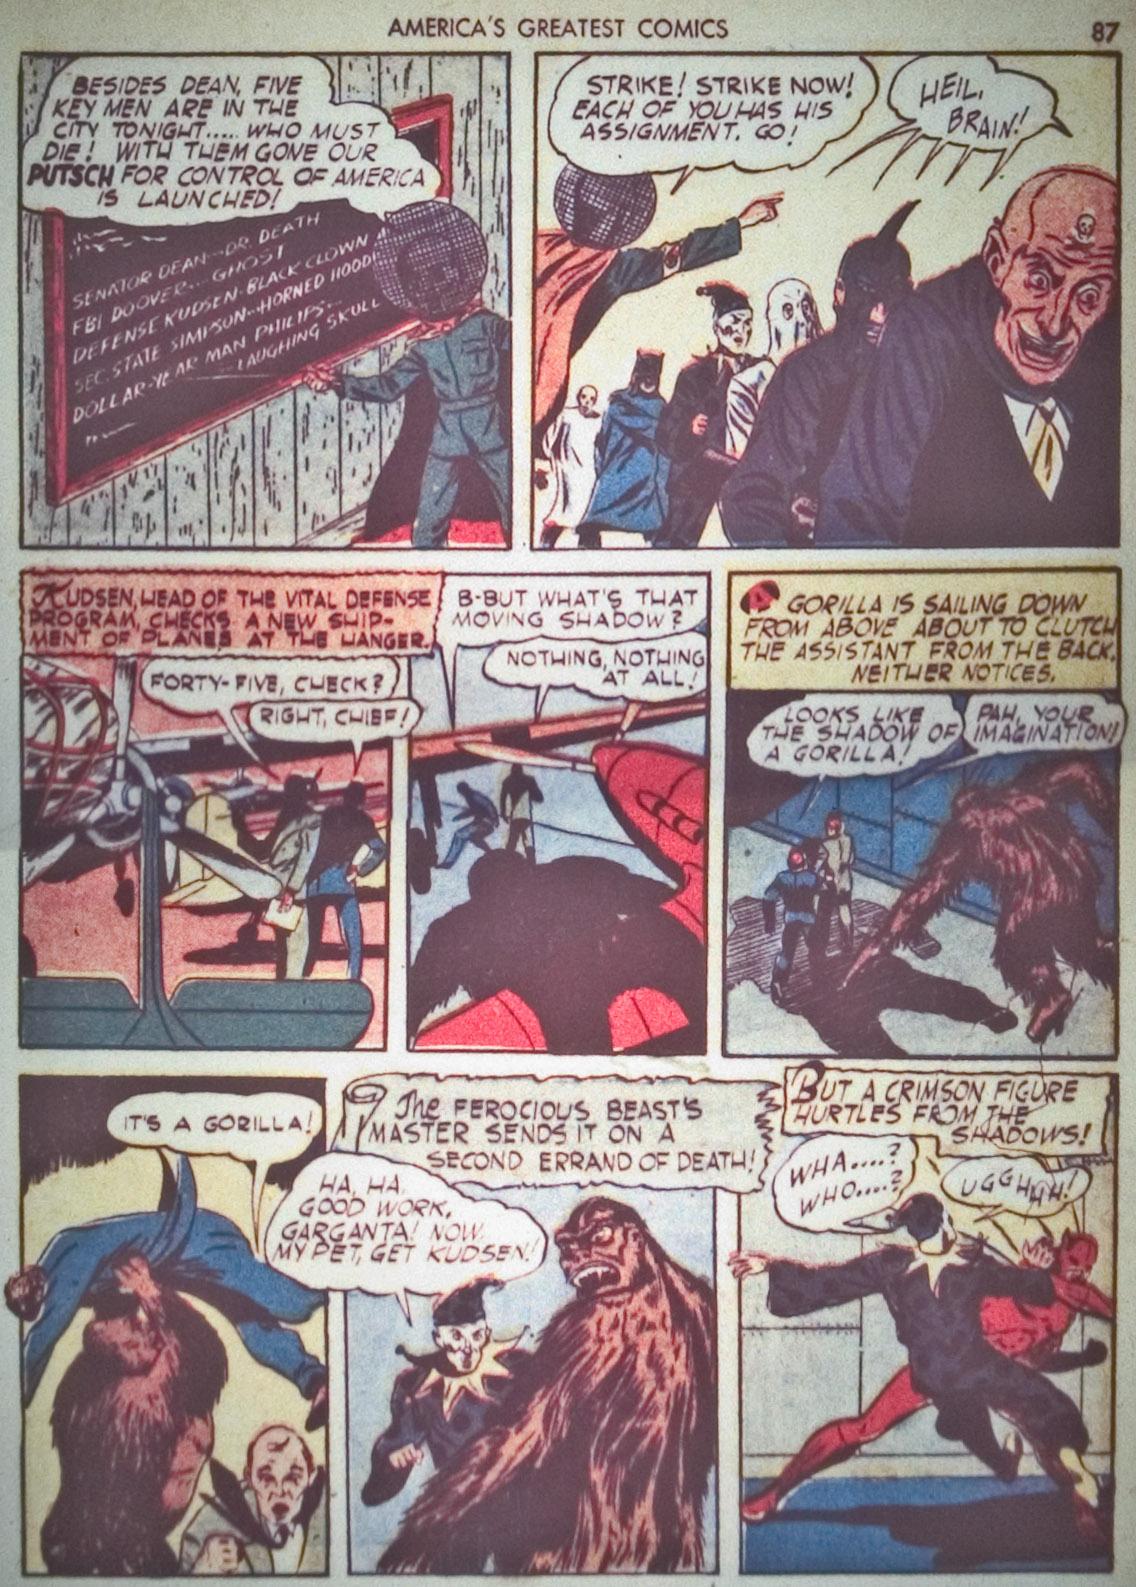 Read online America's Greatest Comics comic -  Issue #1 - 90